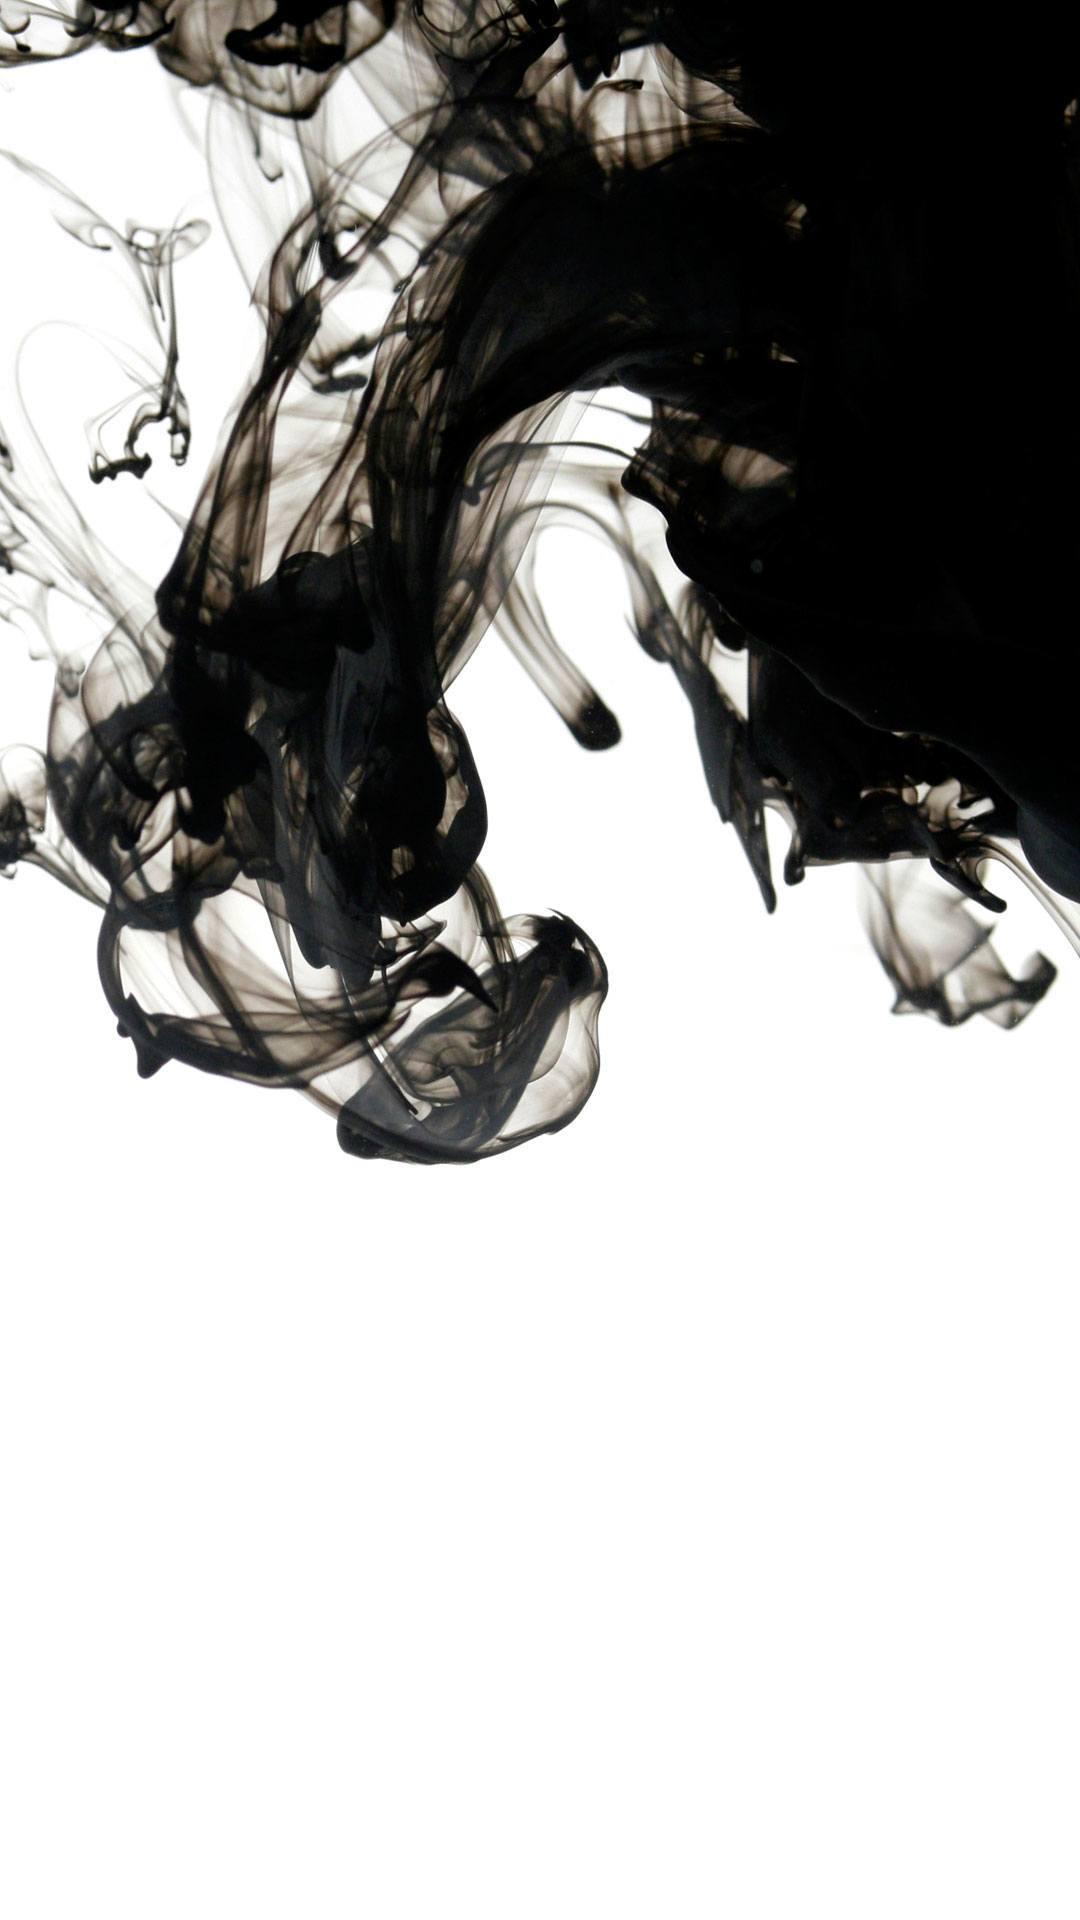 Black ink wallpapers wallpaper cave - Hd ink wallpaper ...